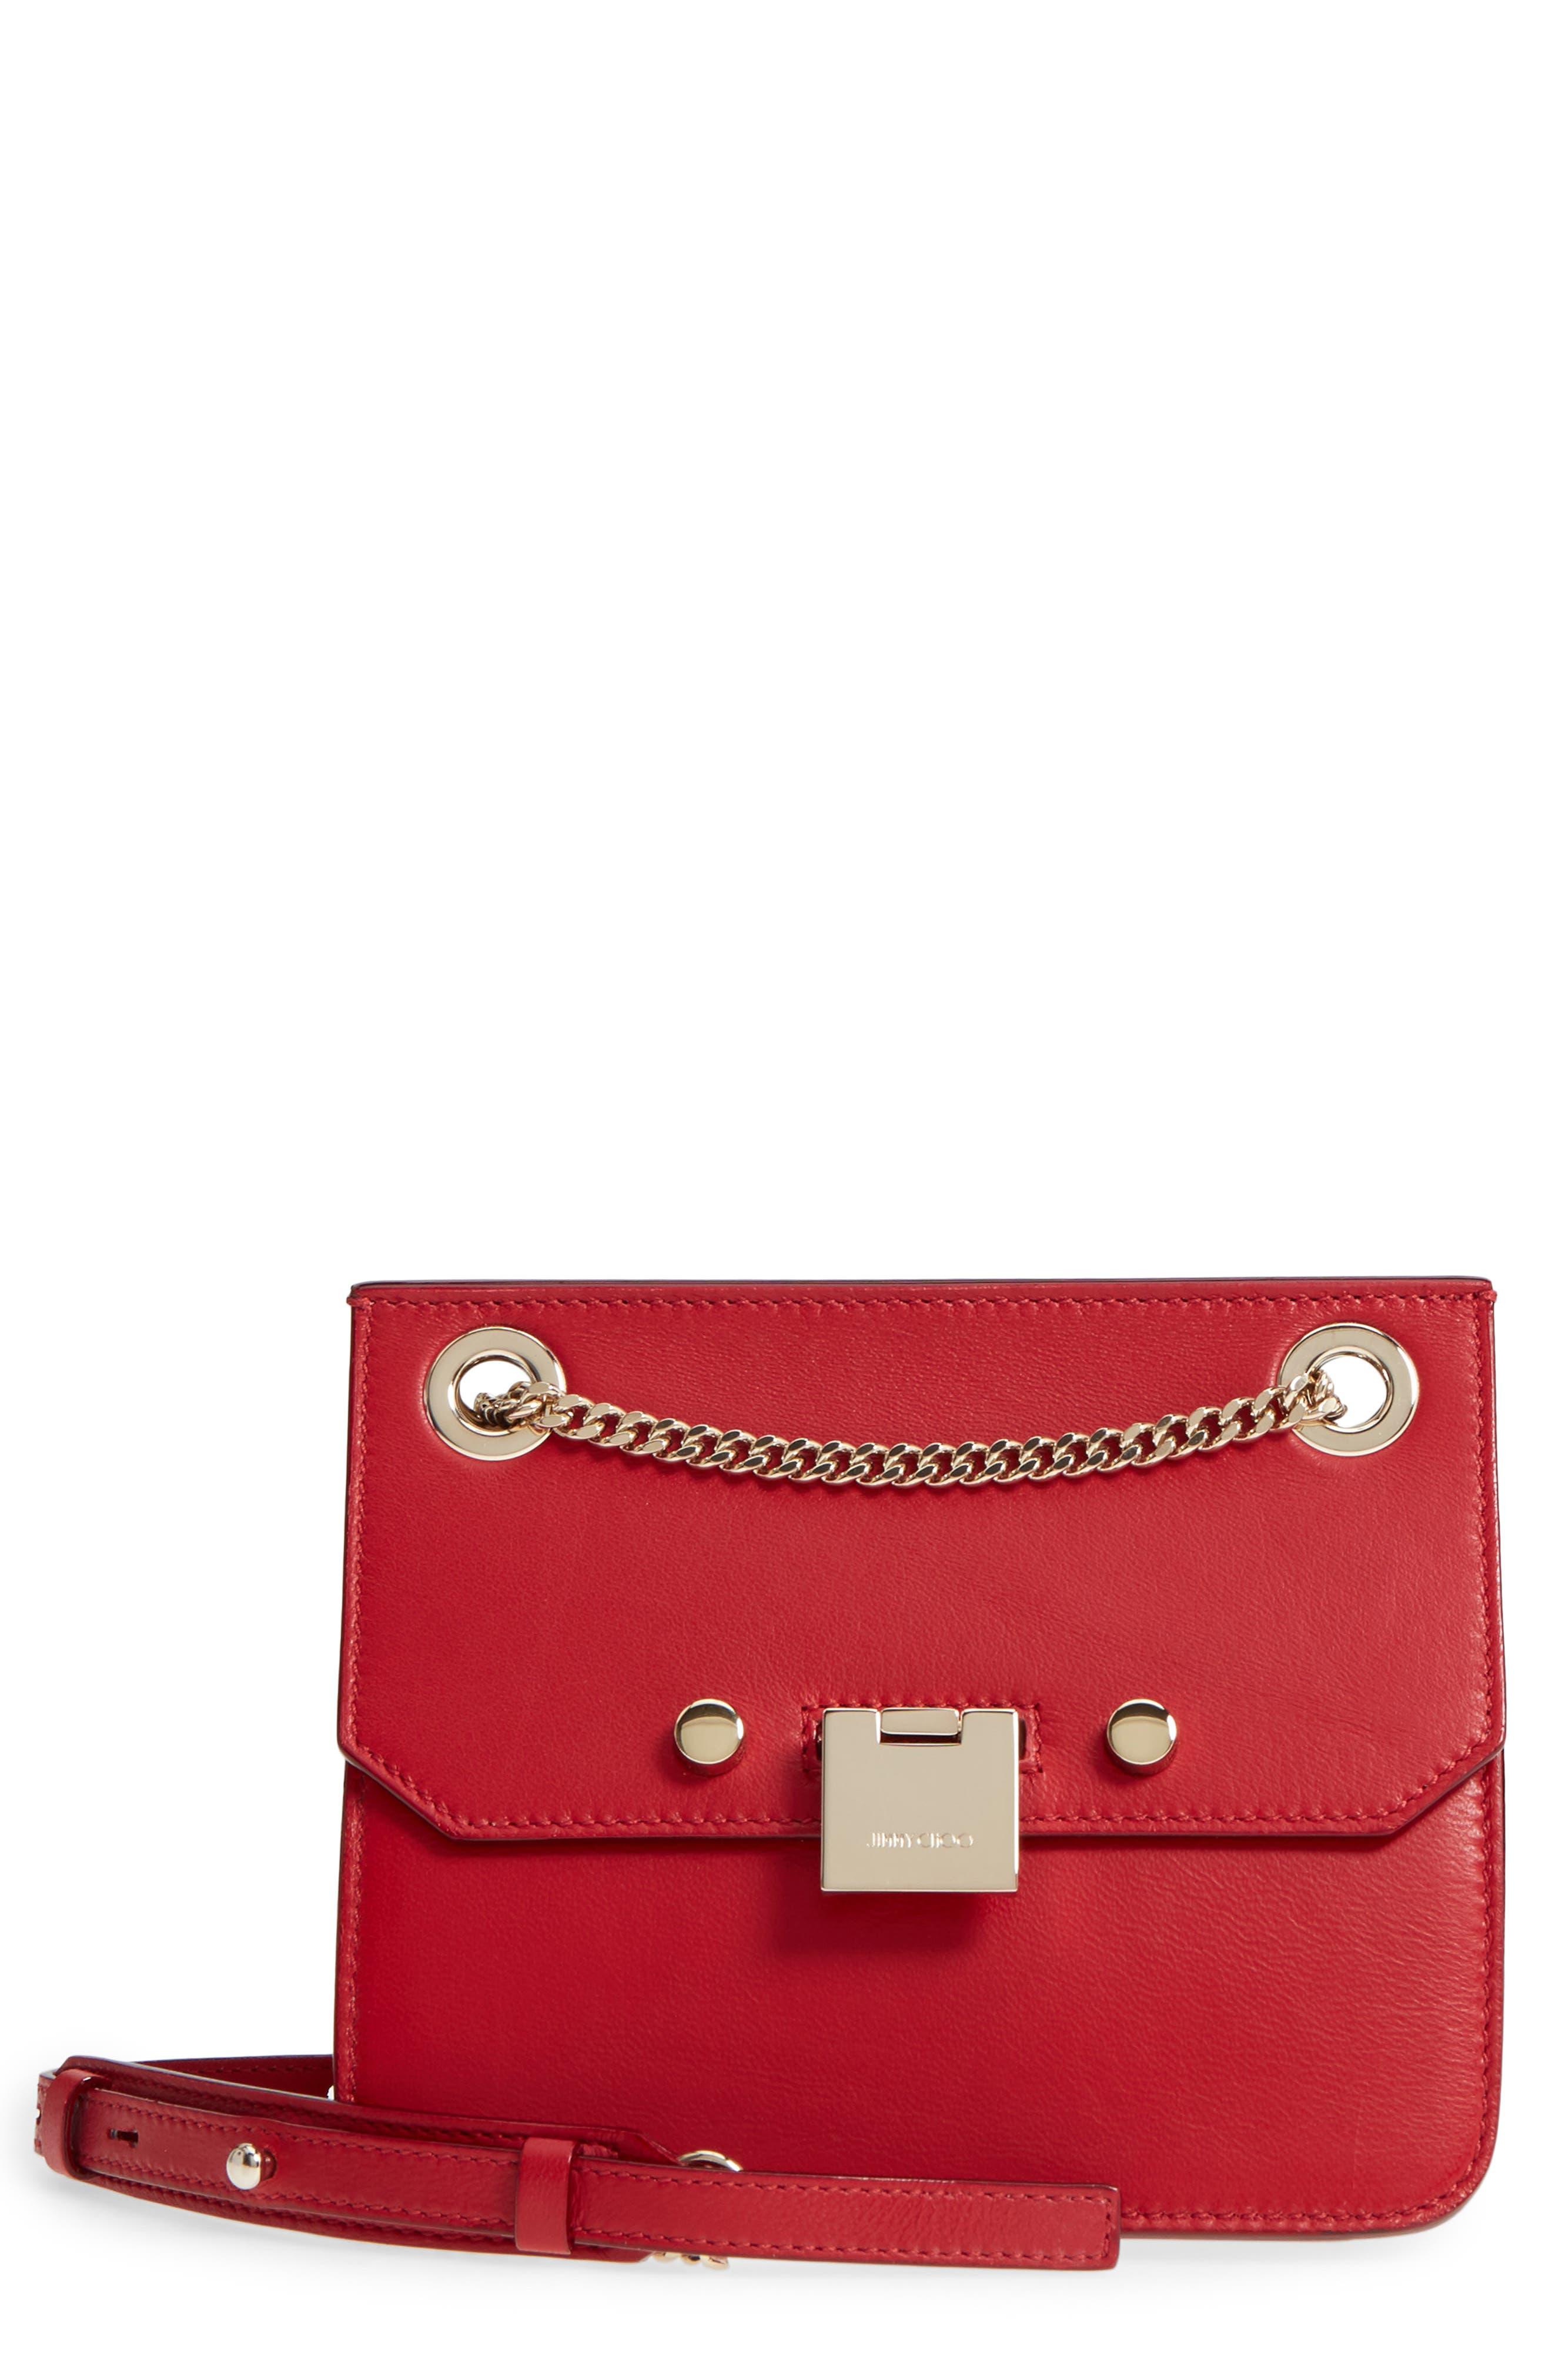 Rebel Mini Colorblock Leather Crossbody Bag,                             Main thumbnail 1, color,                             600